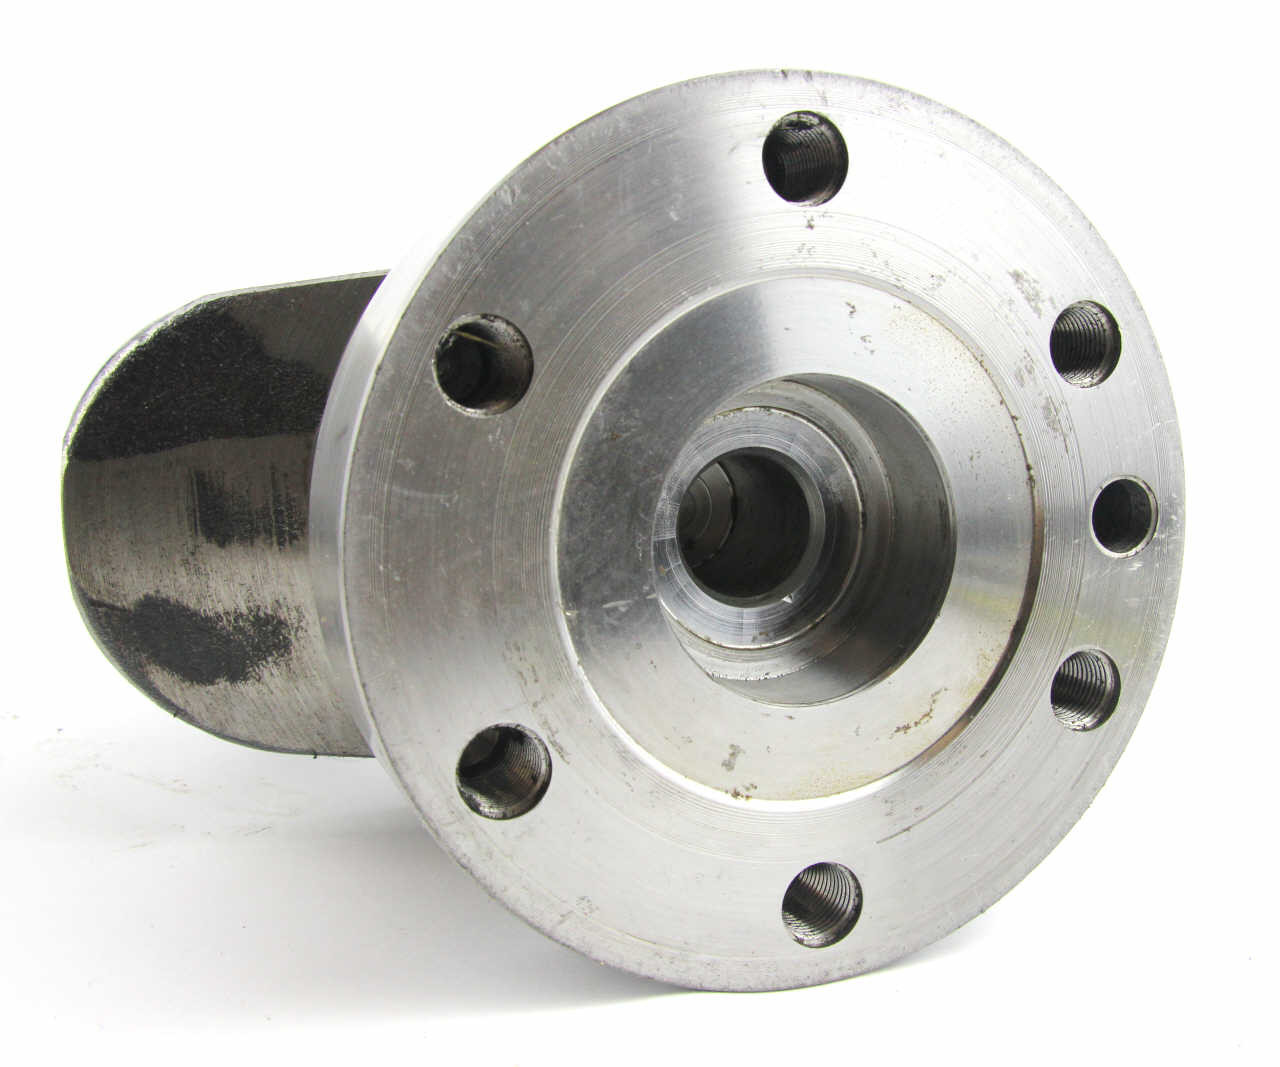 Perkins M90 Crankshaft Kit - parts4engines.com Crankshaft Rear